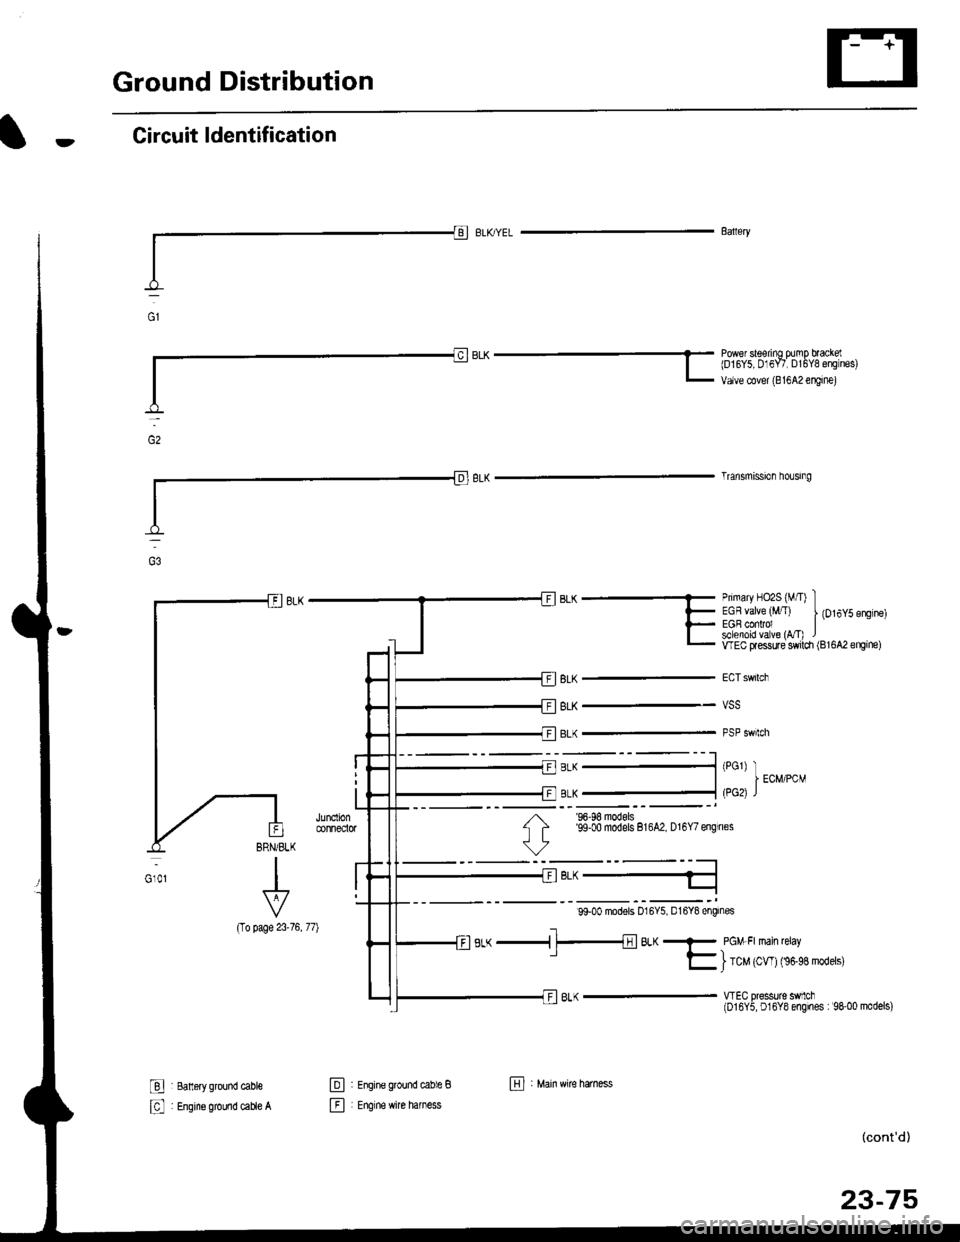 Honda Civic 2000 6g Workshop Manual B16a2 Wiring Diagram Page 1545 Ground Distribution Circuit Ldentification